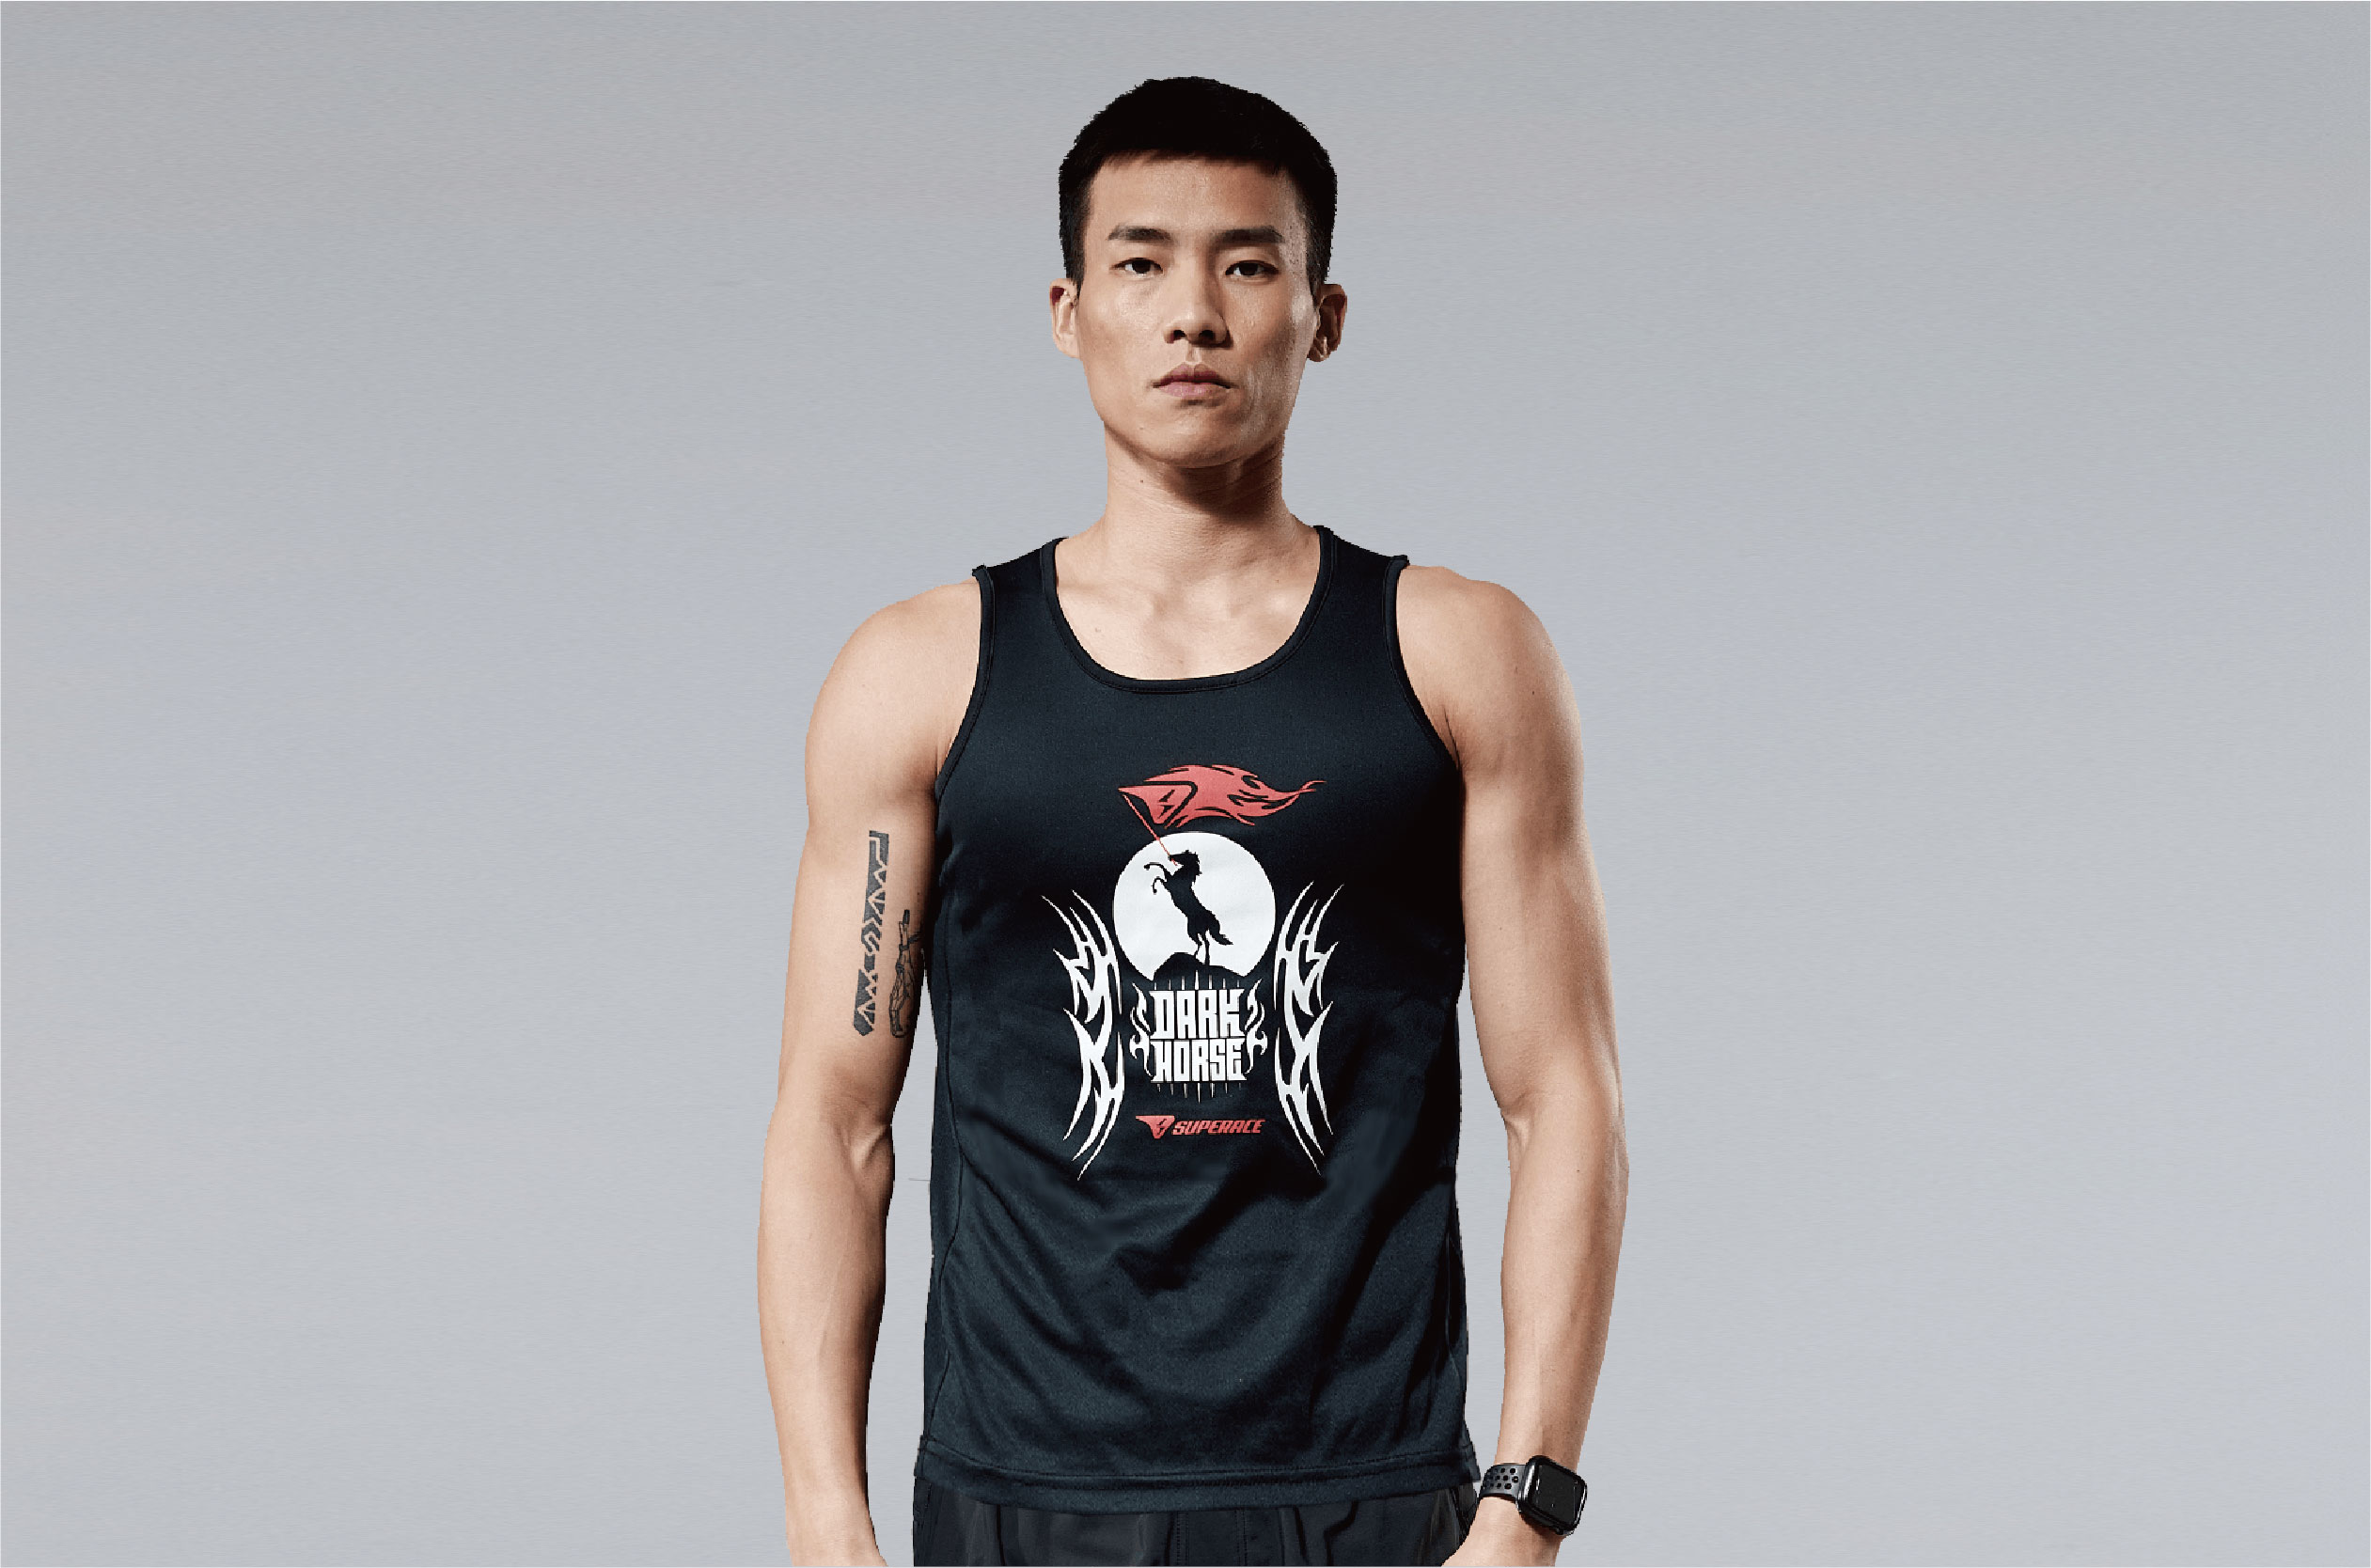 SUPERACE DH Running TANK TOP / UNISEX